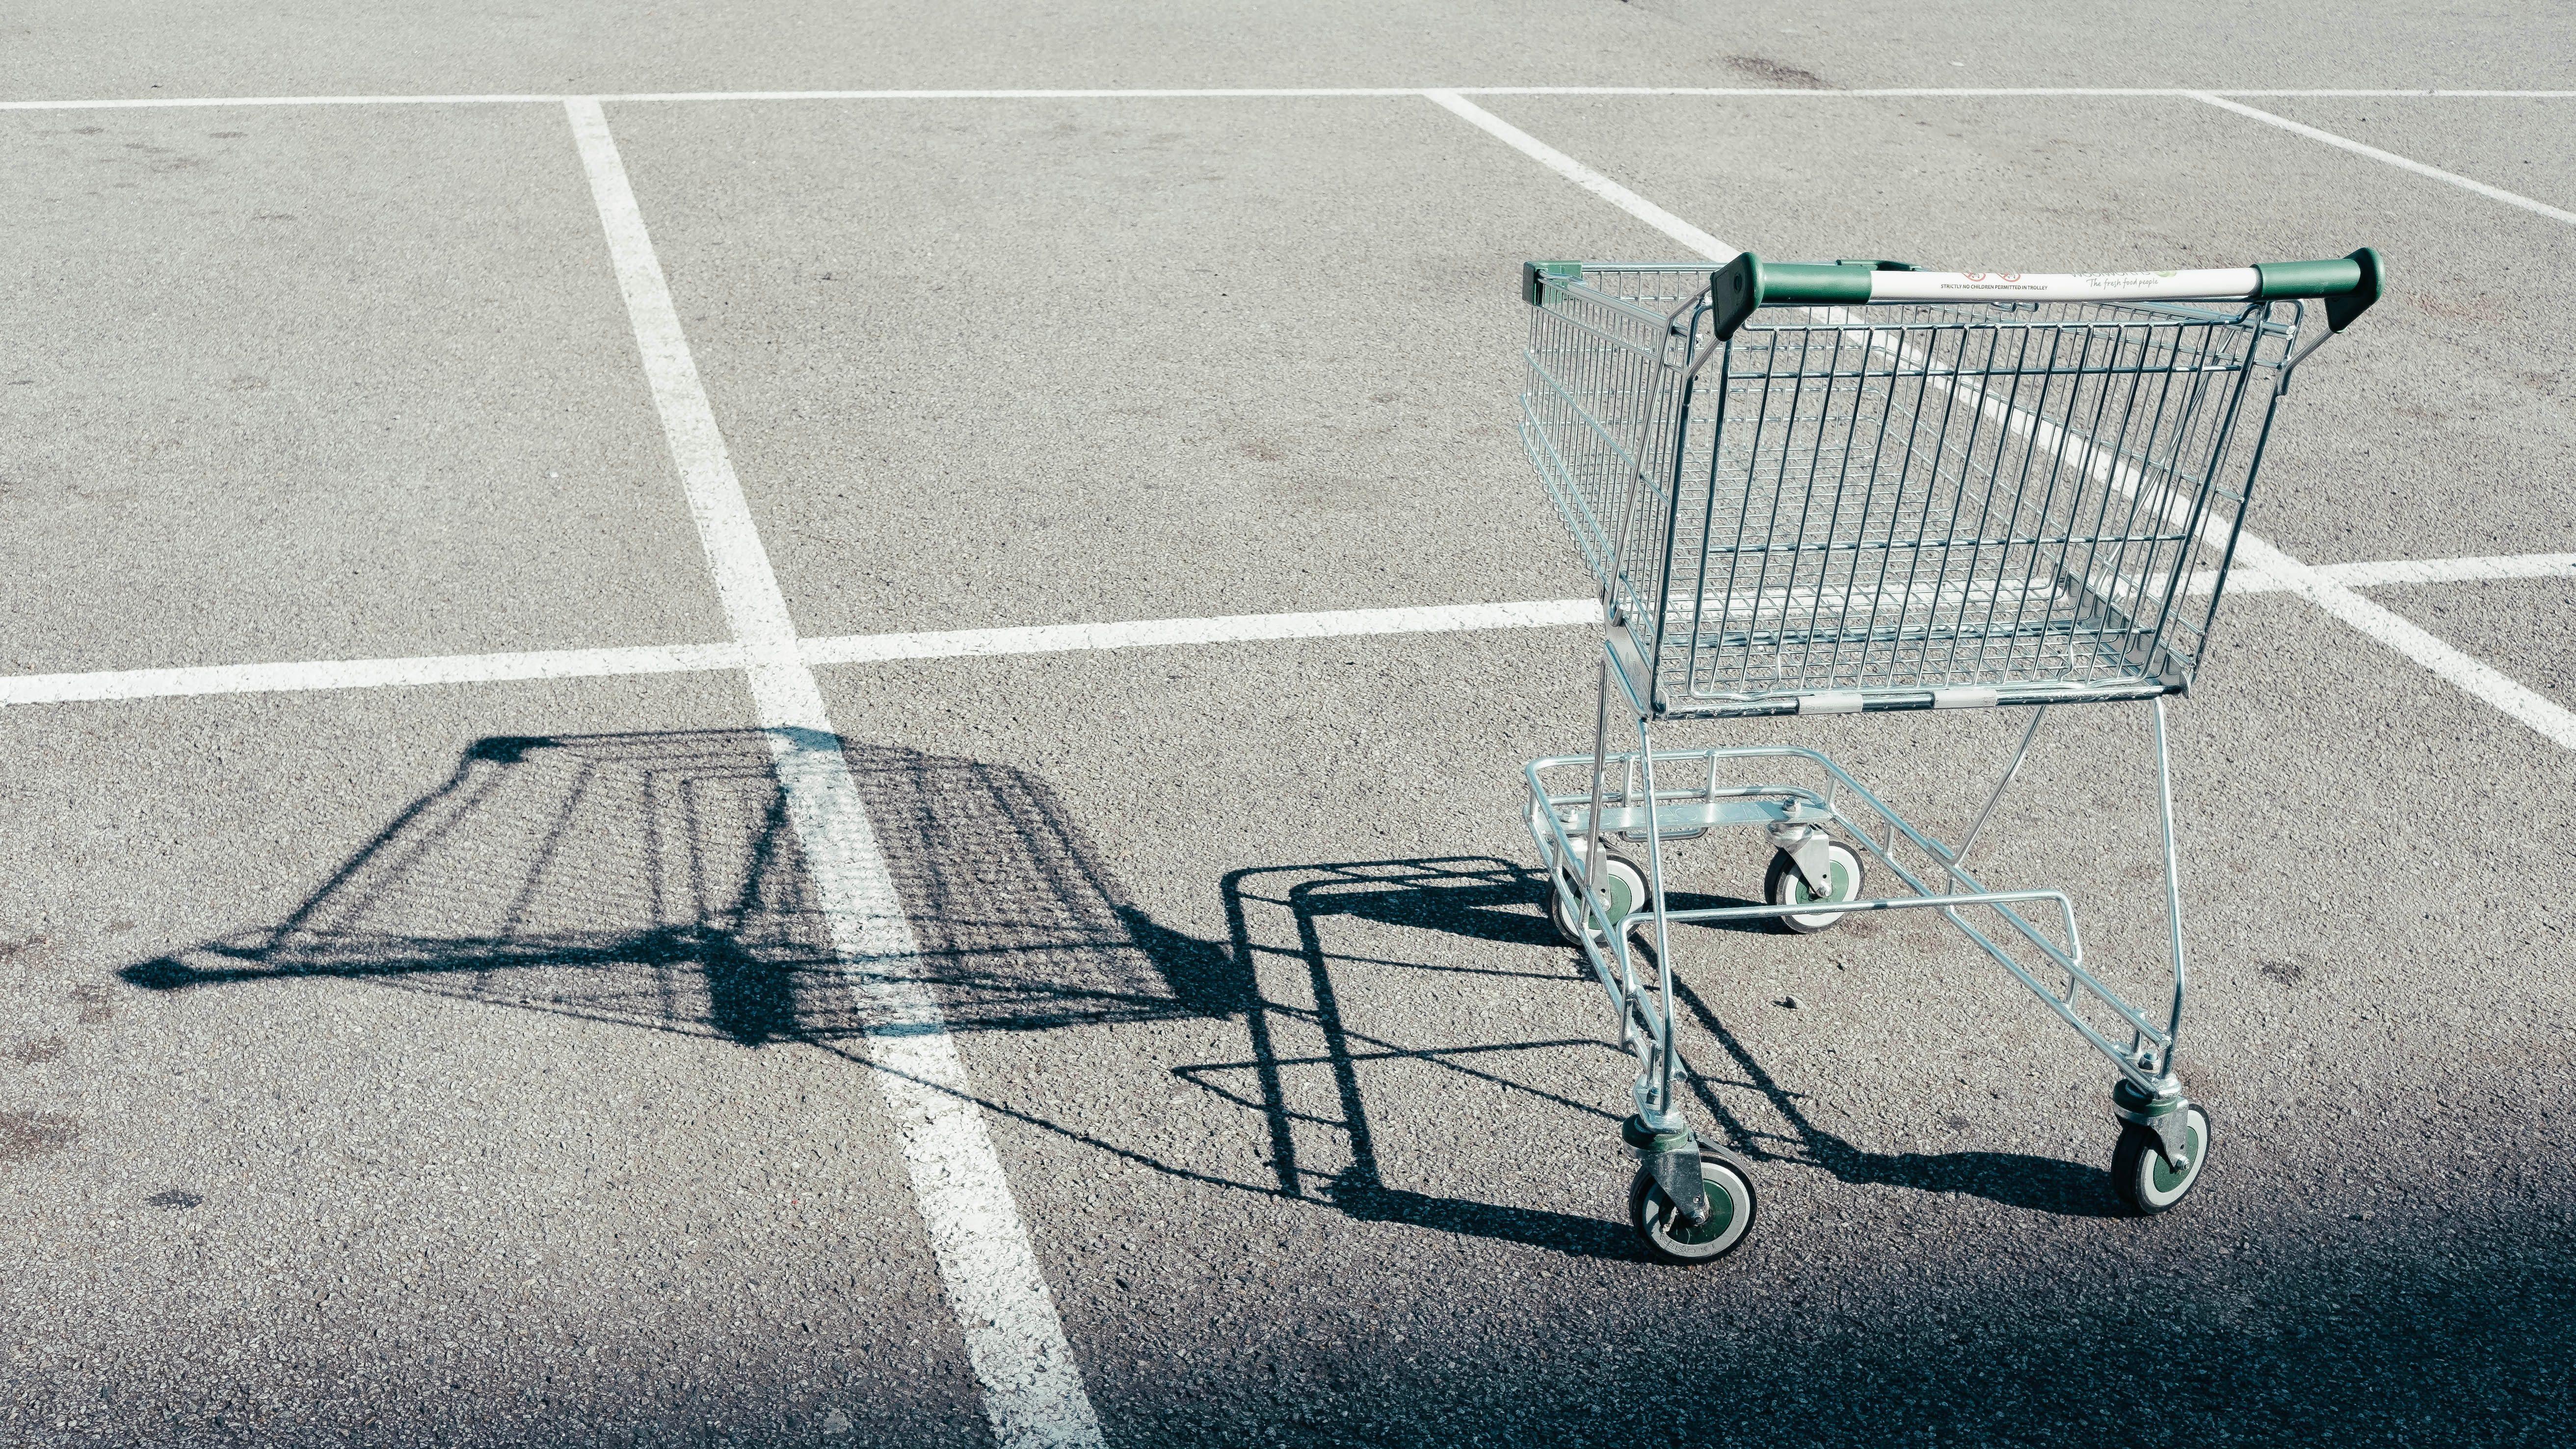 Ingenieros crean máquina de rayos UV para desinfectar carritos del supermercado